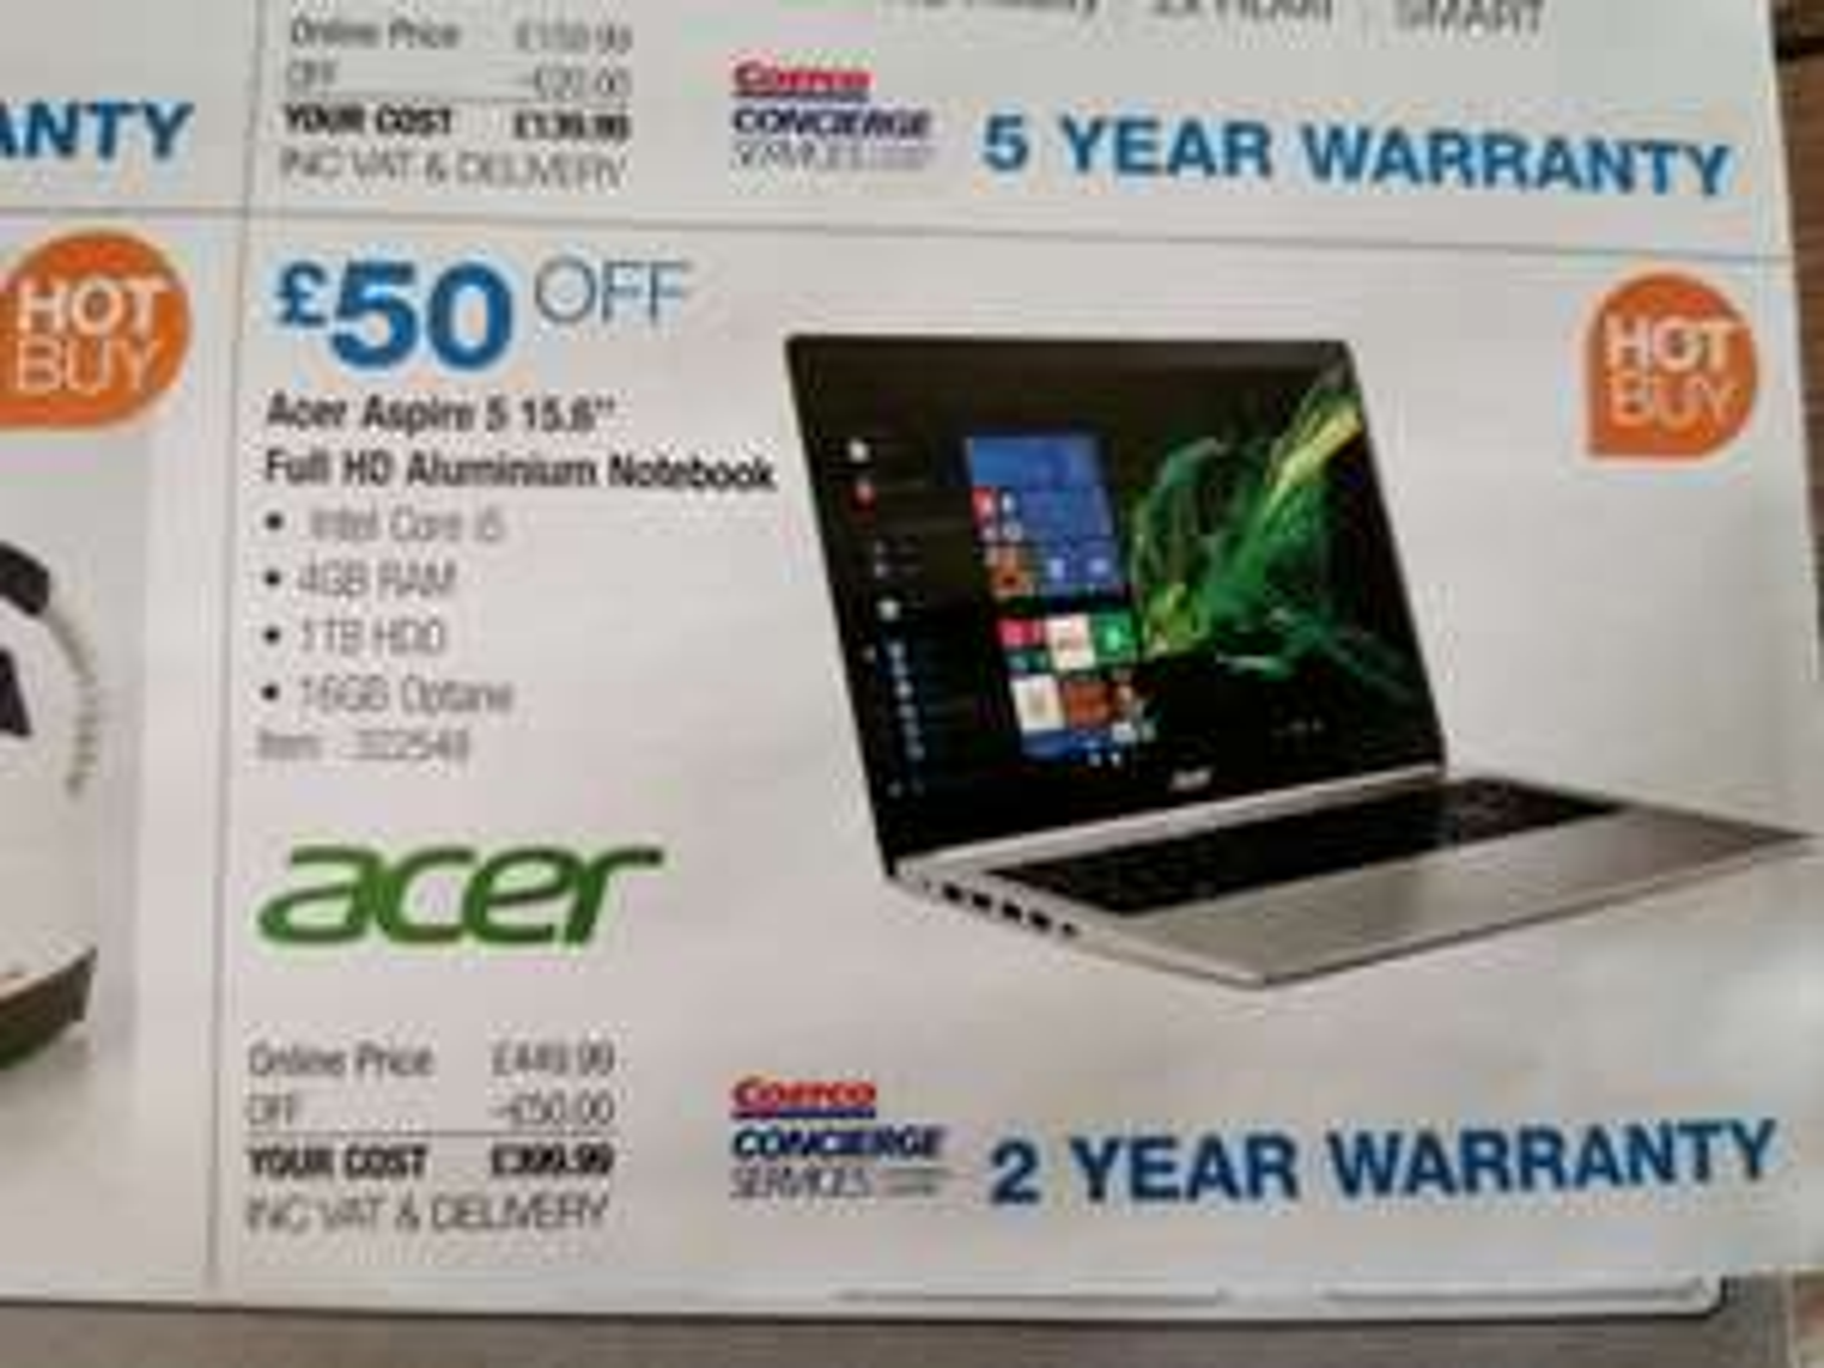 "Acer Aspire 5 15.6"" laptop £399.99 @ Costco"